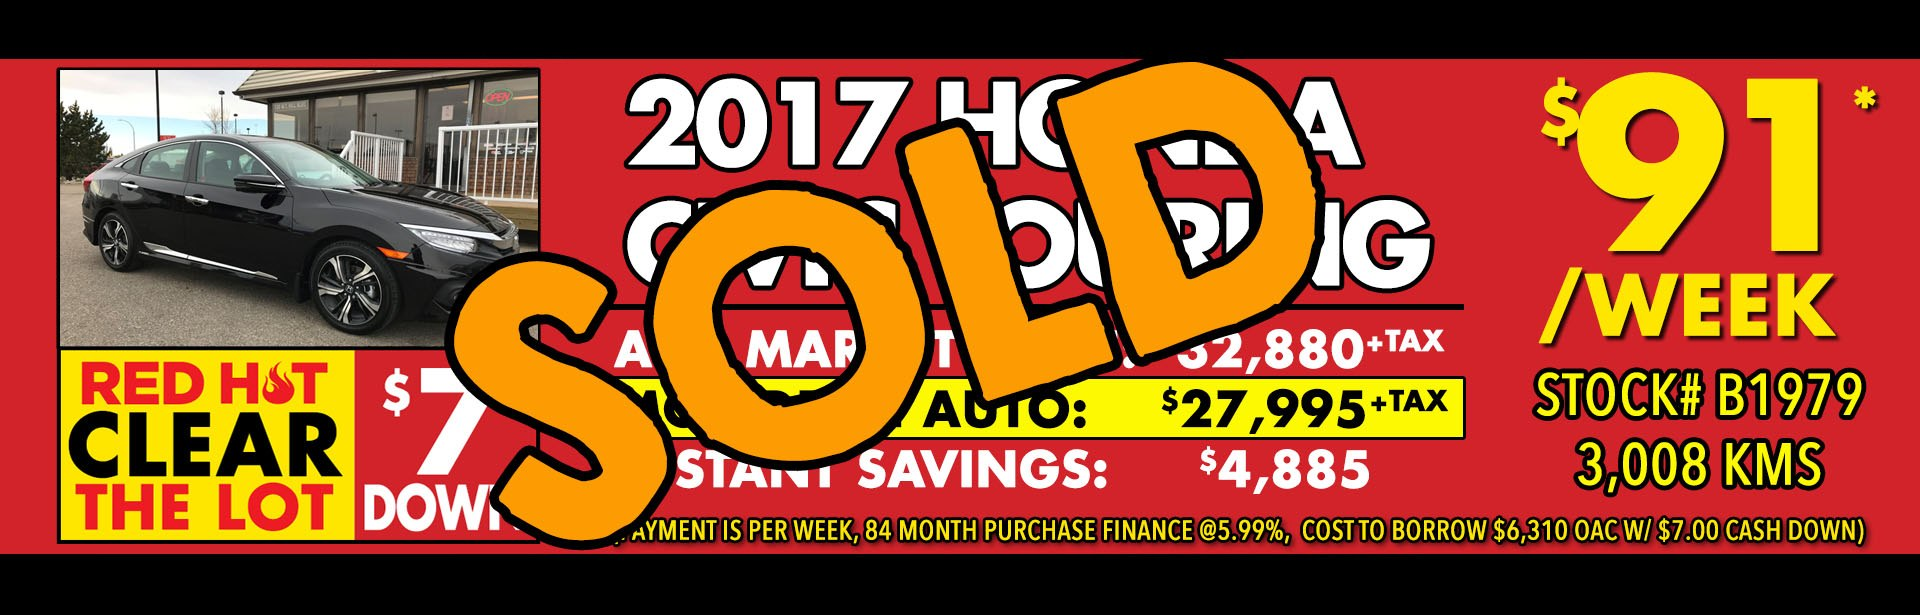 Red Hot - B1979 2017 Honda Civic Touring - Mar 2018 - Sold